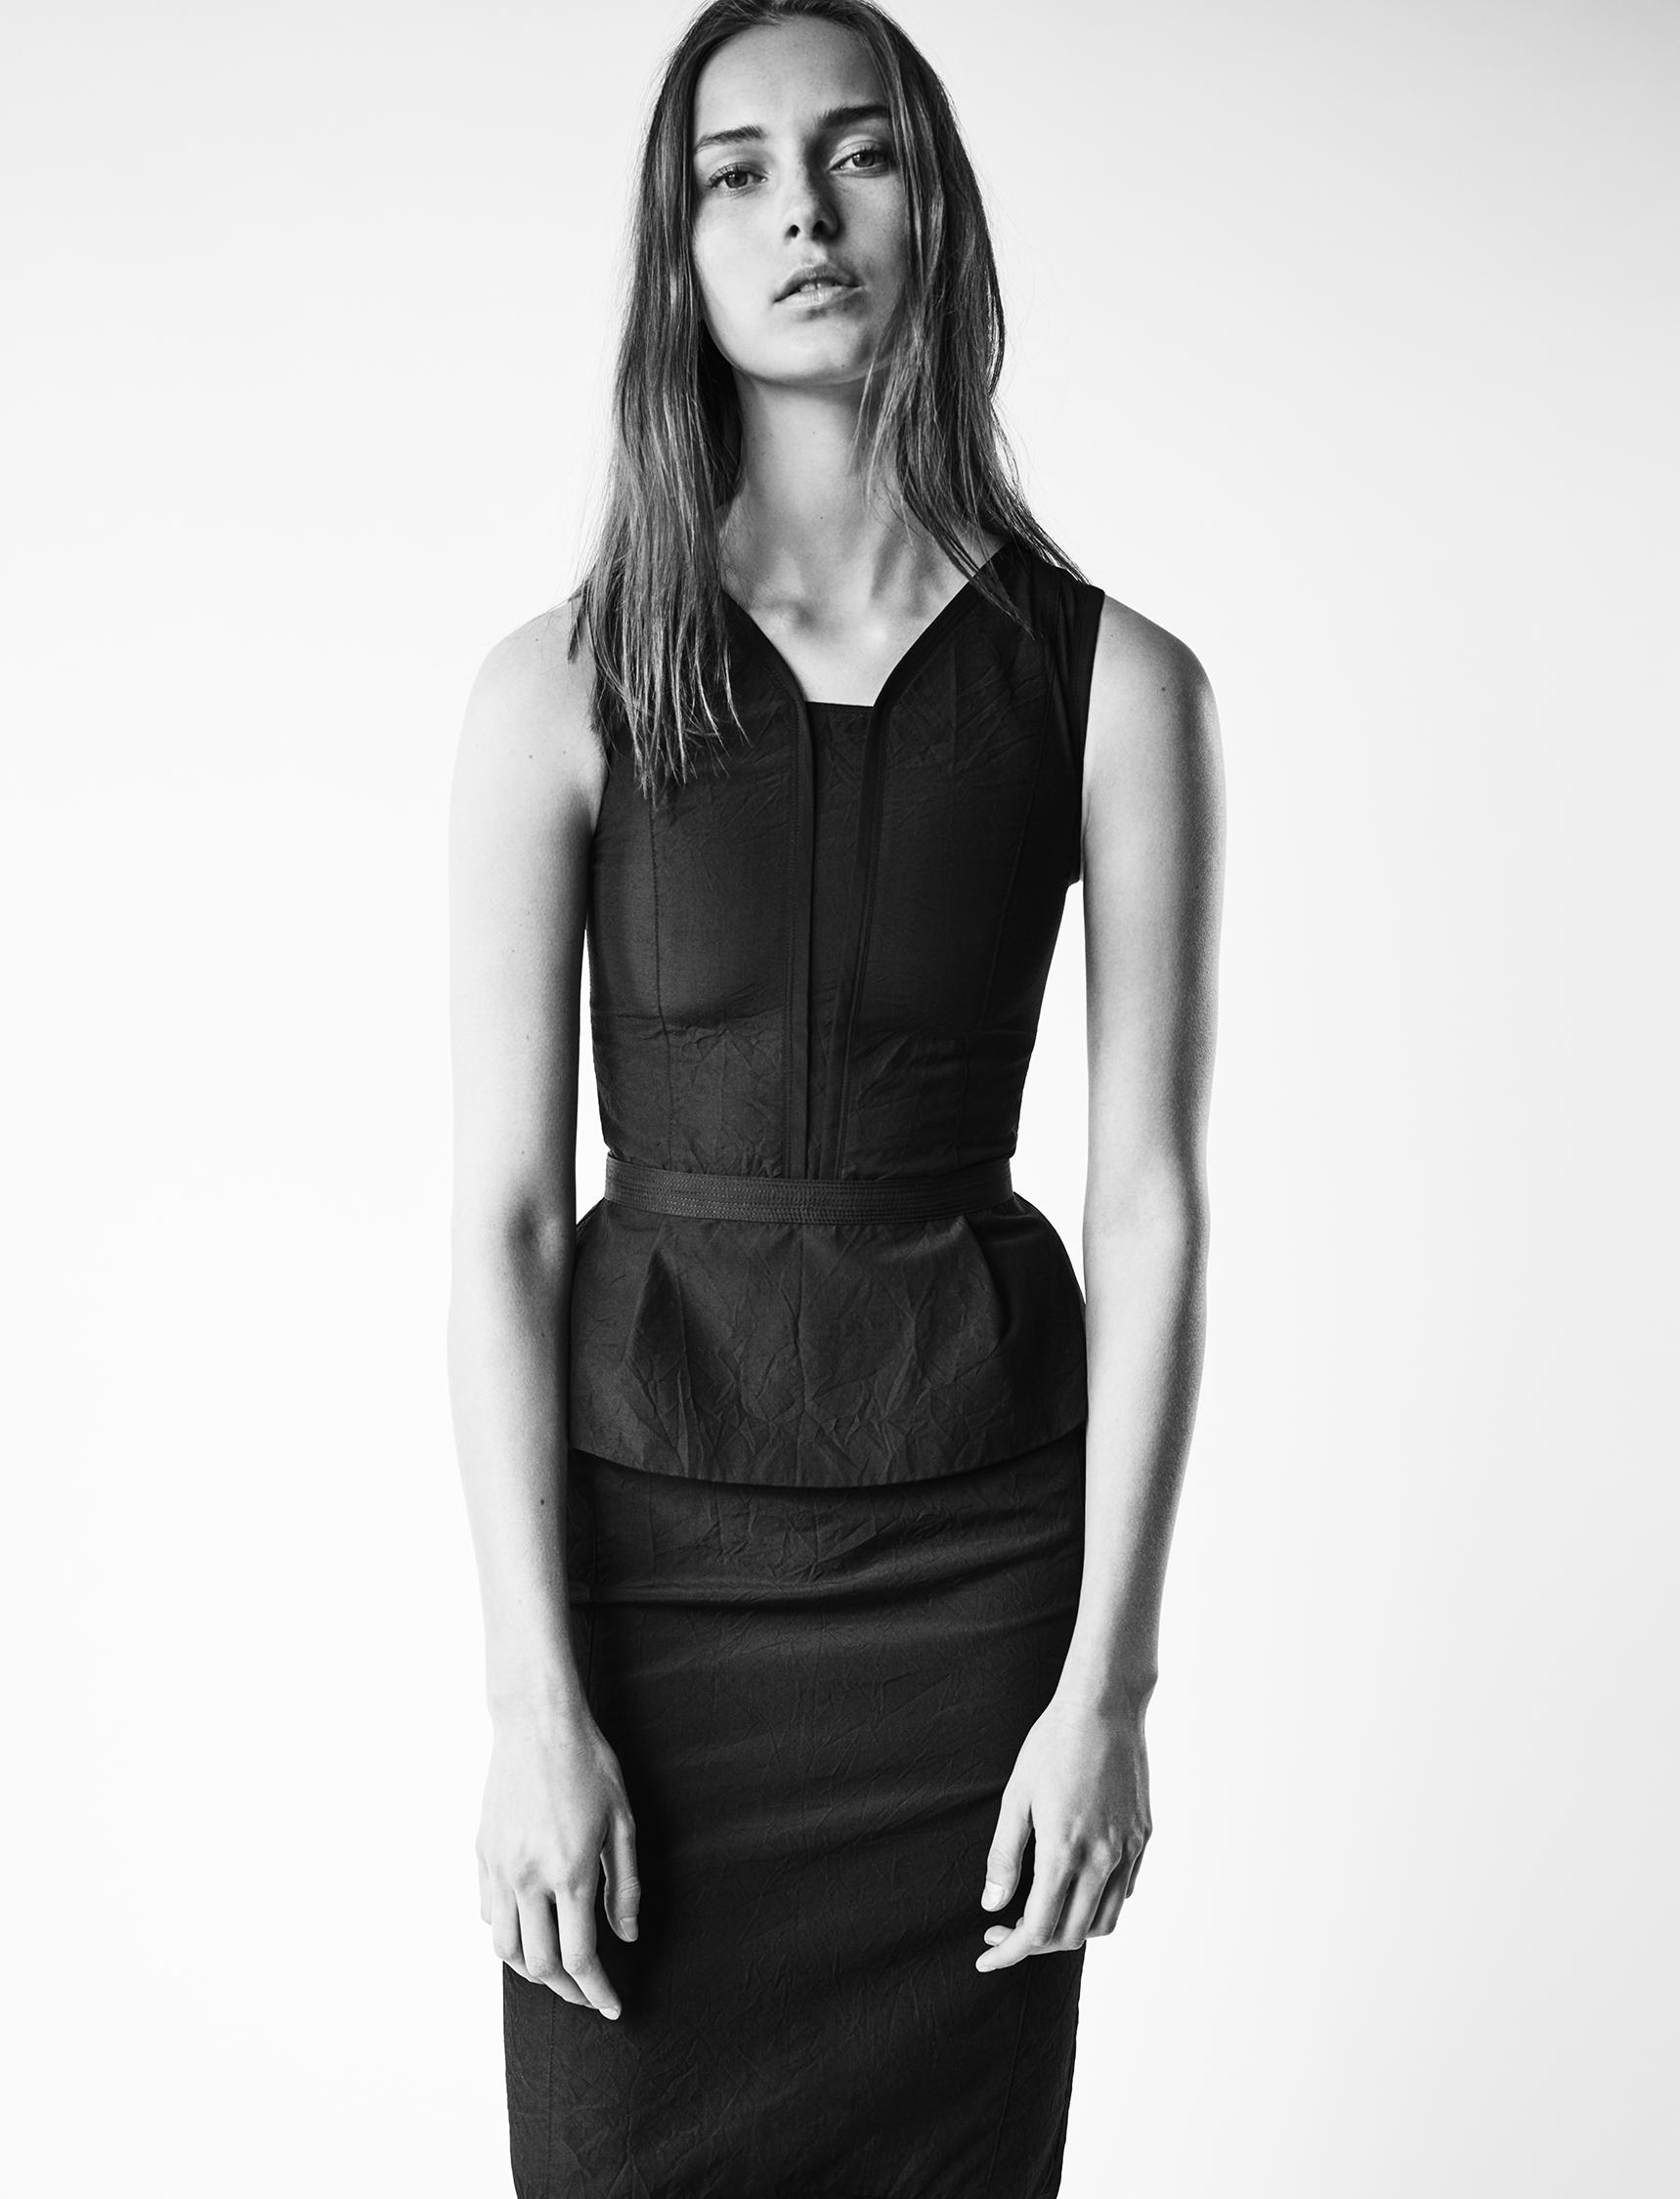 Look 6 Black wool-linen top with black wool-linen pencil skirt.